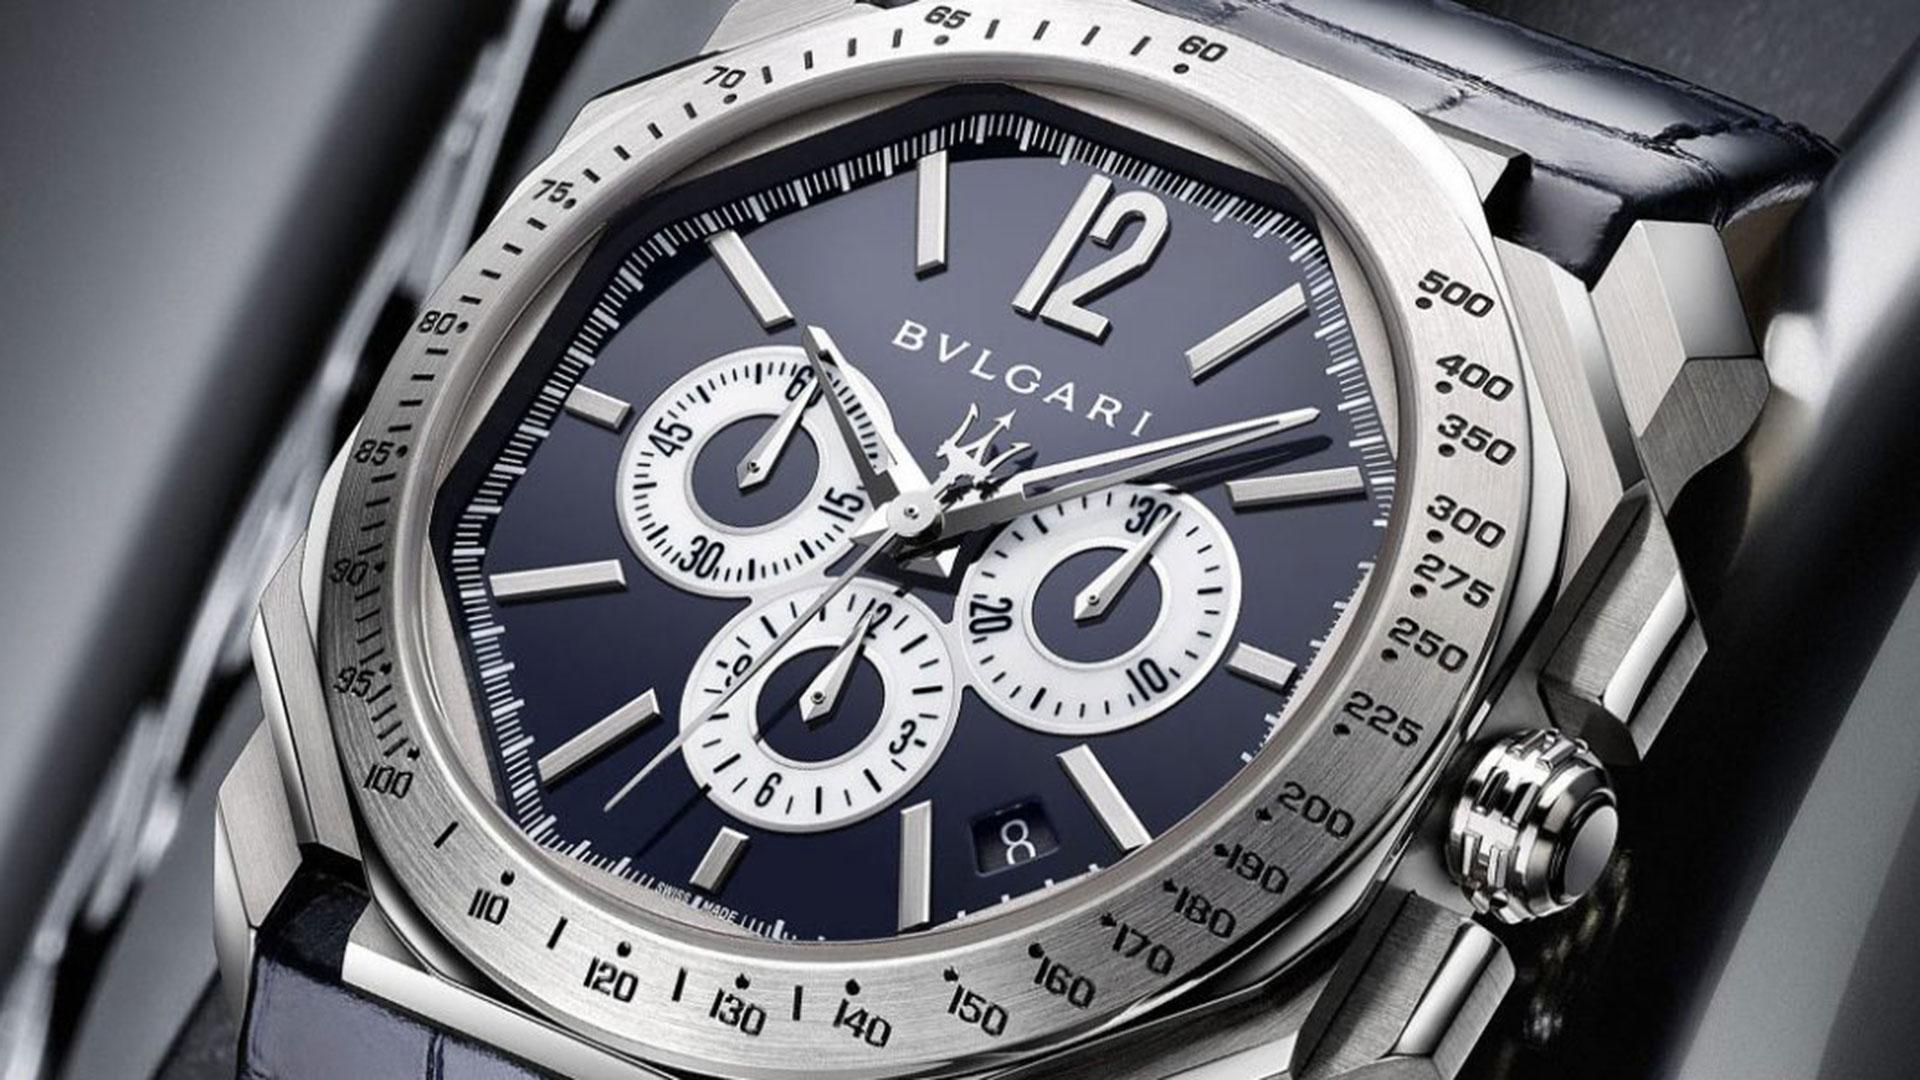 Bvlgari-Octo-Maserati-Chronograph-1-1170x600